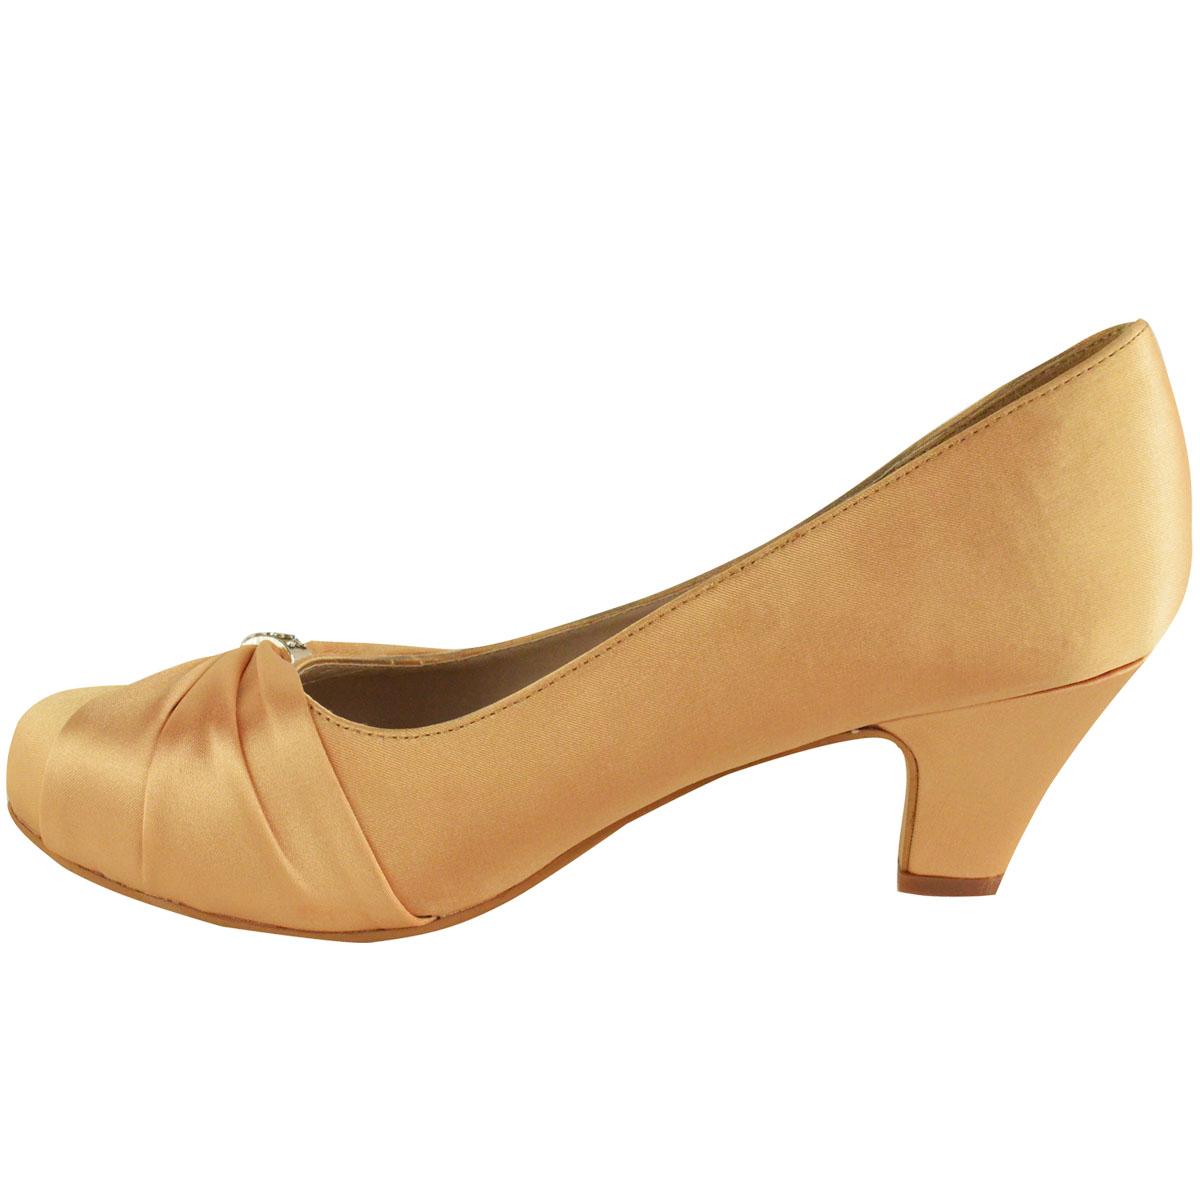 clothes shoes accessories gt s shoes gt heels